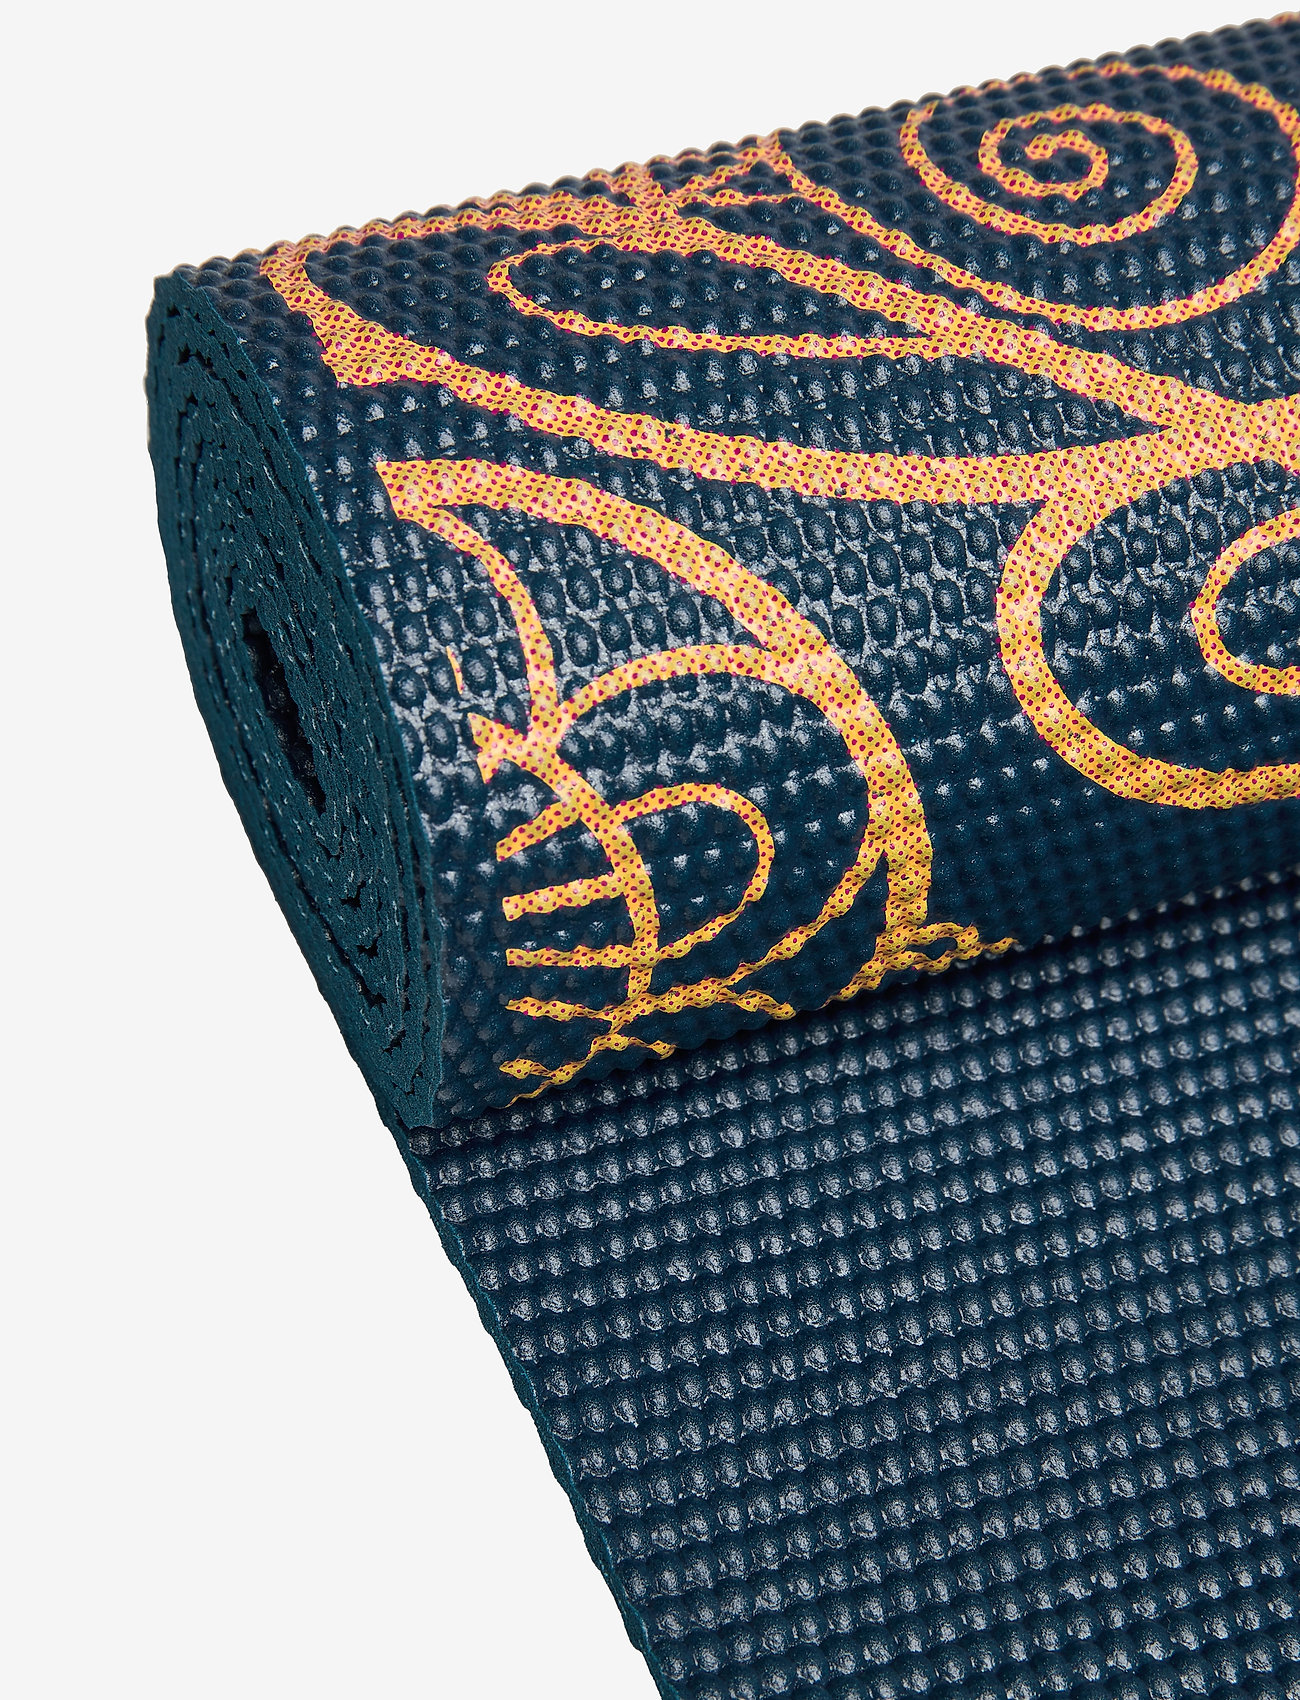 Gaiam - 4mm Yoga Mat Vivid Zest - yogamatten & uitrusting - vivid zest - 1